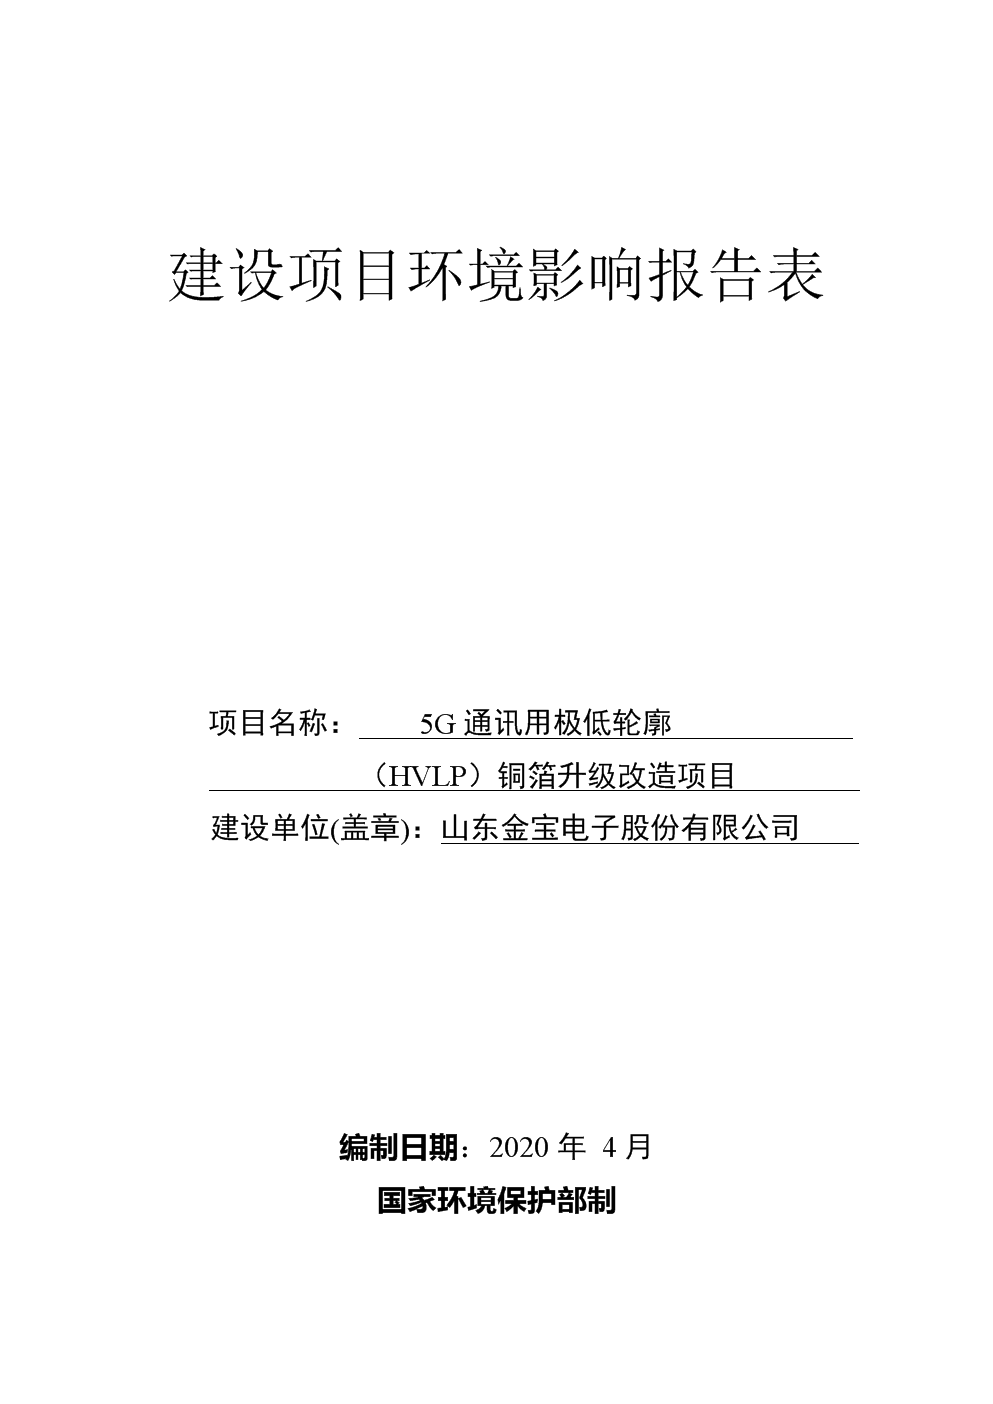 5G通讯用极低轮廓(HVLP)铜箔升级改造项目环境影响报告表.docx